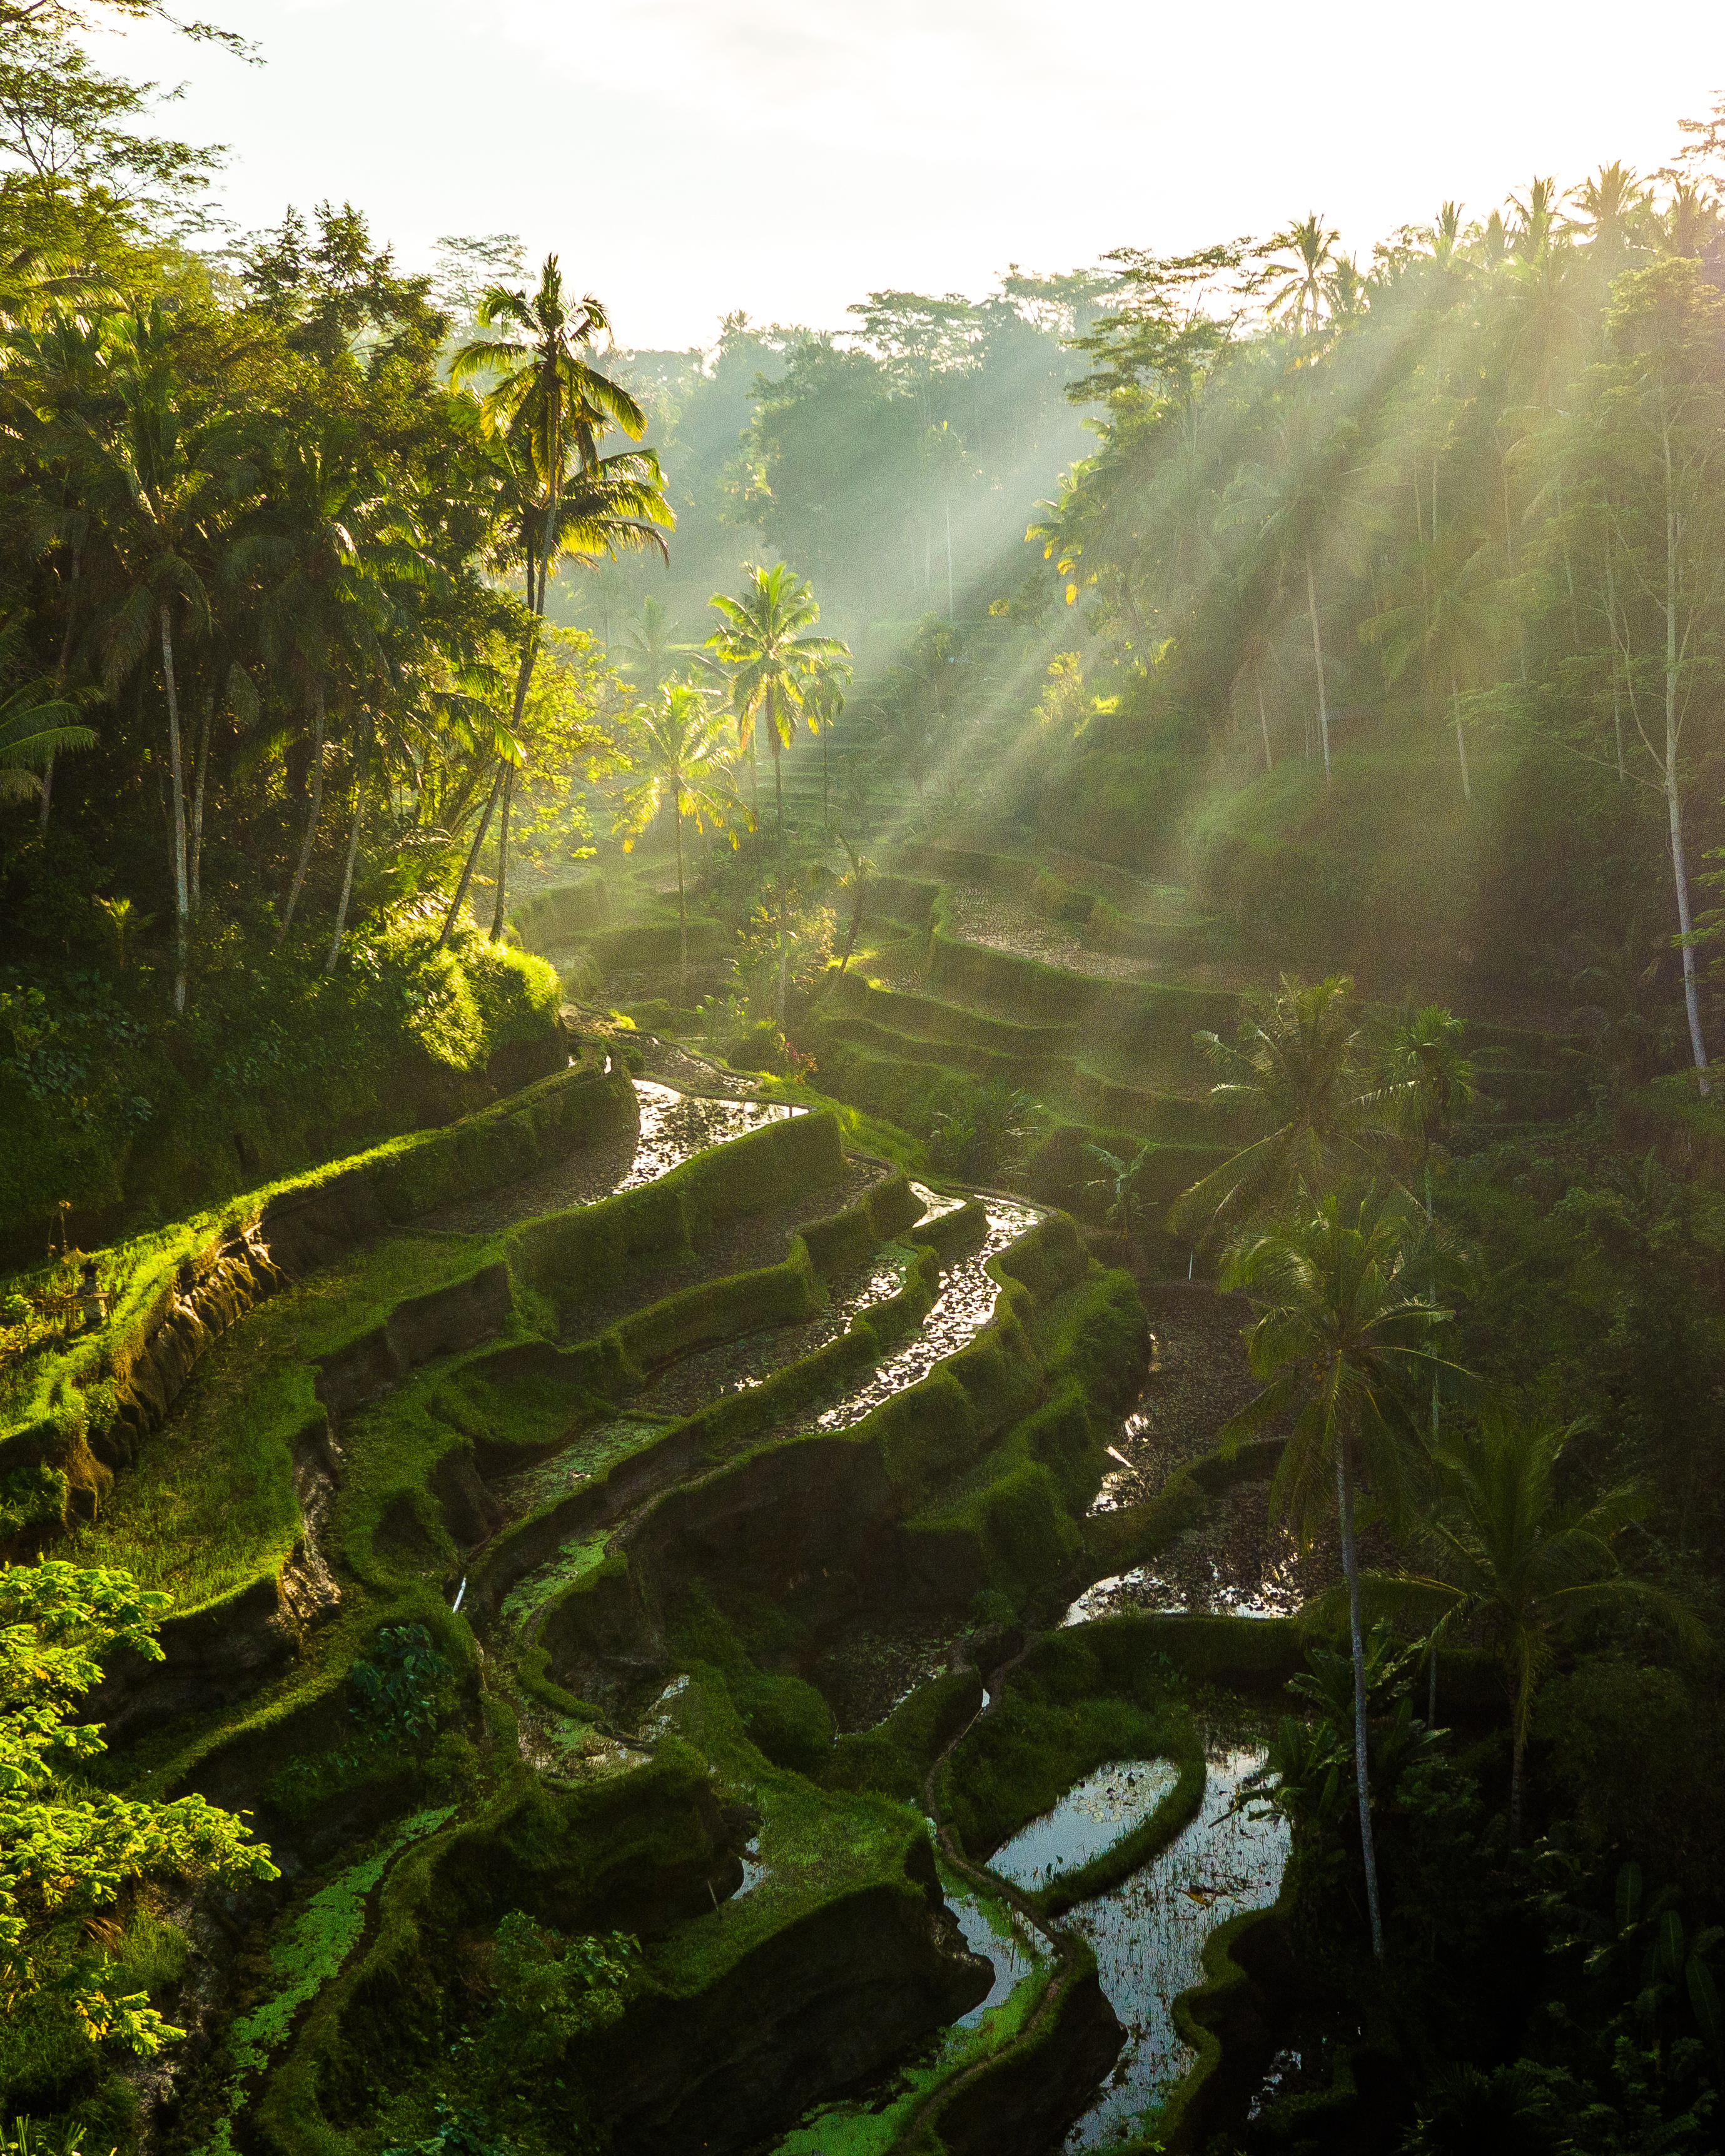 Bali by Jacob Riglin